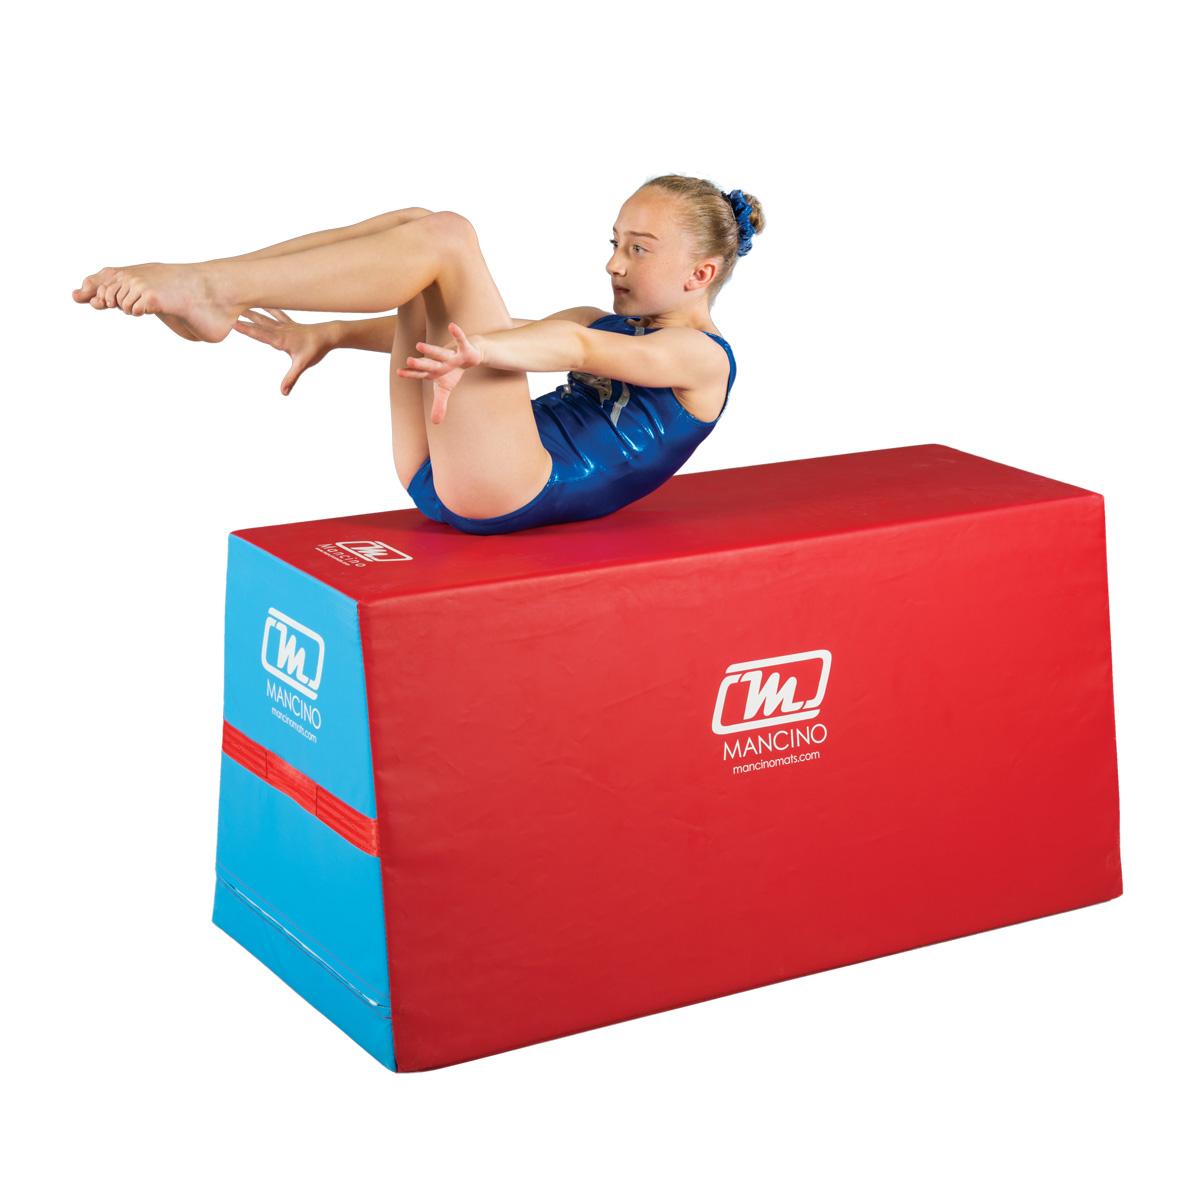 gymnast on mancino unizoid skill builder trainer